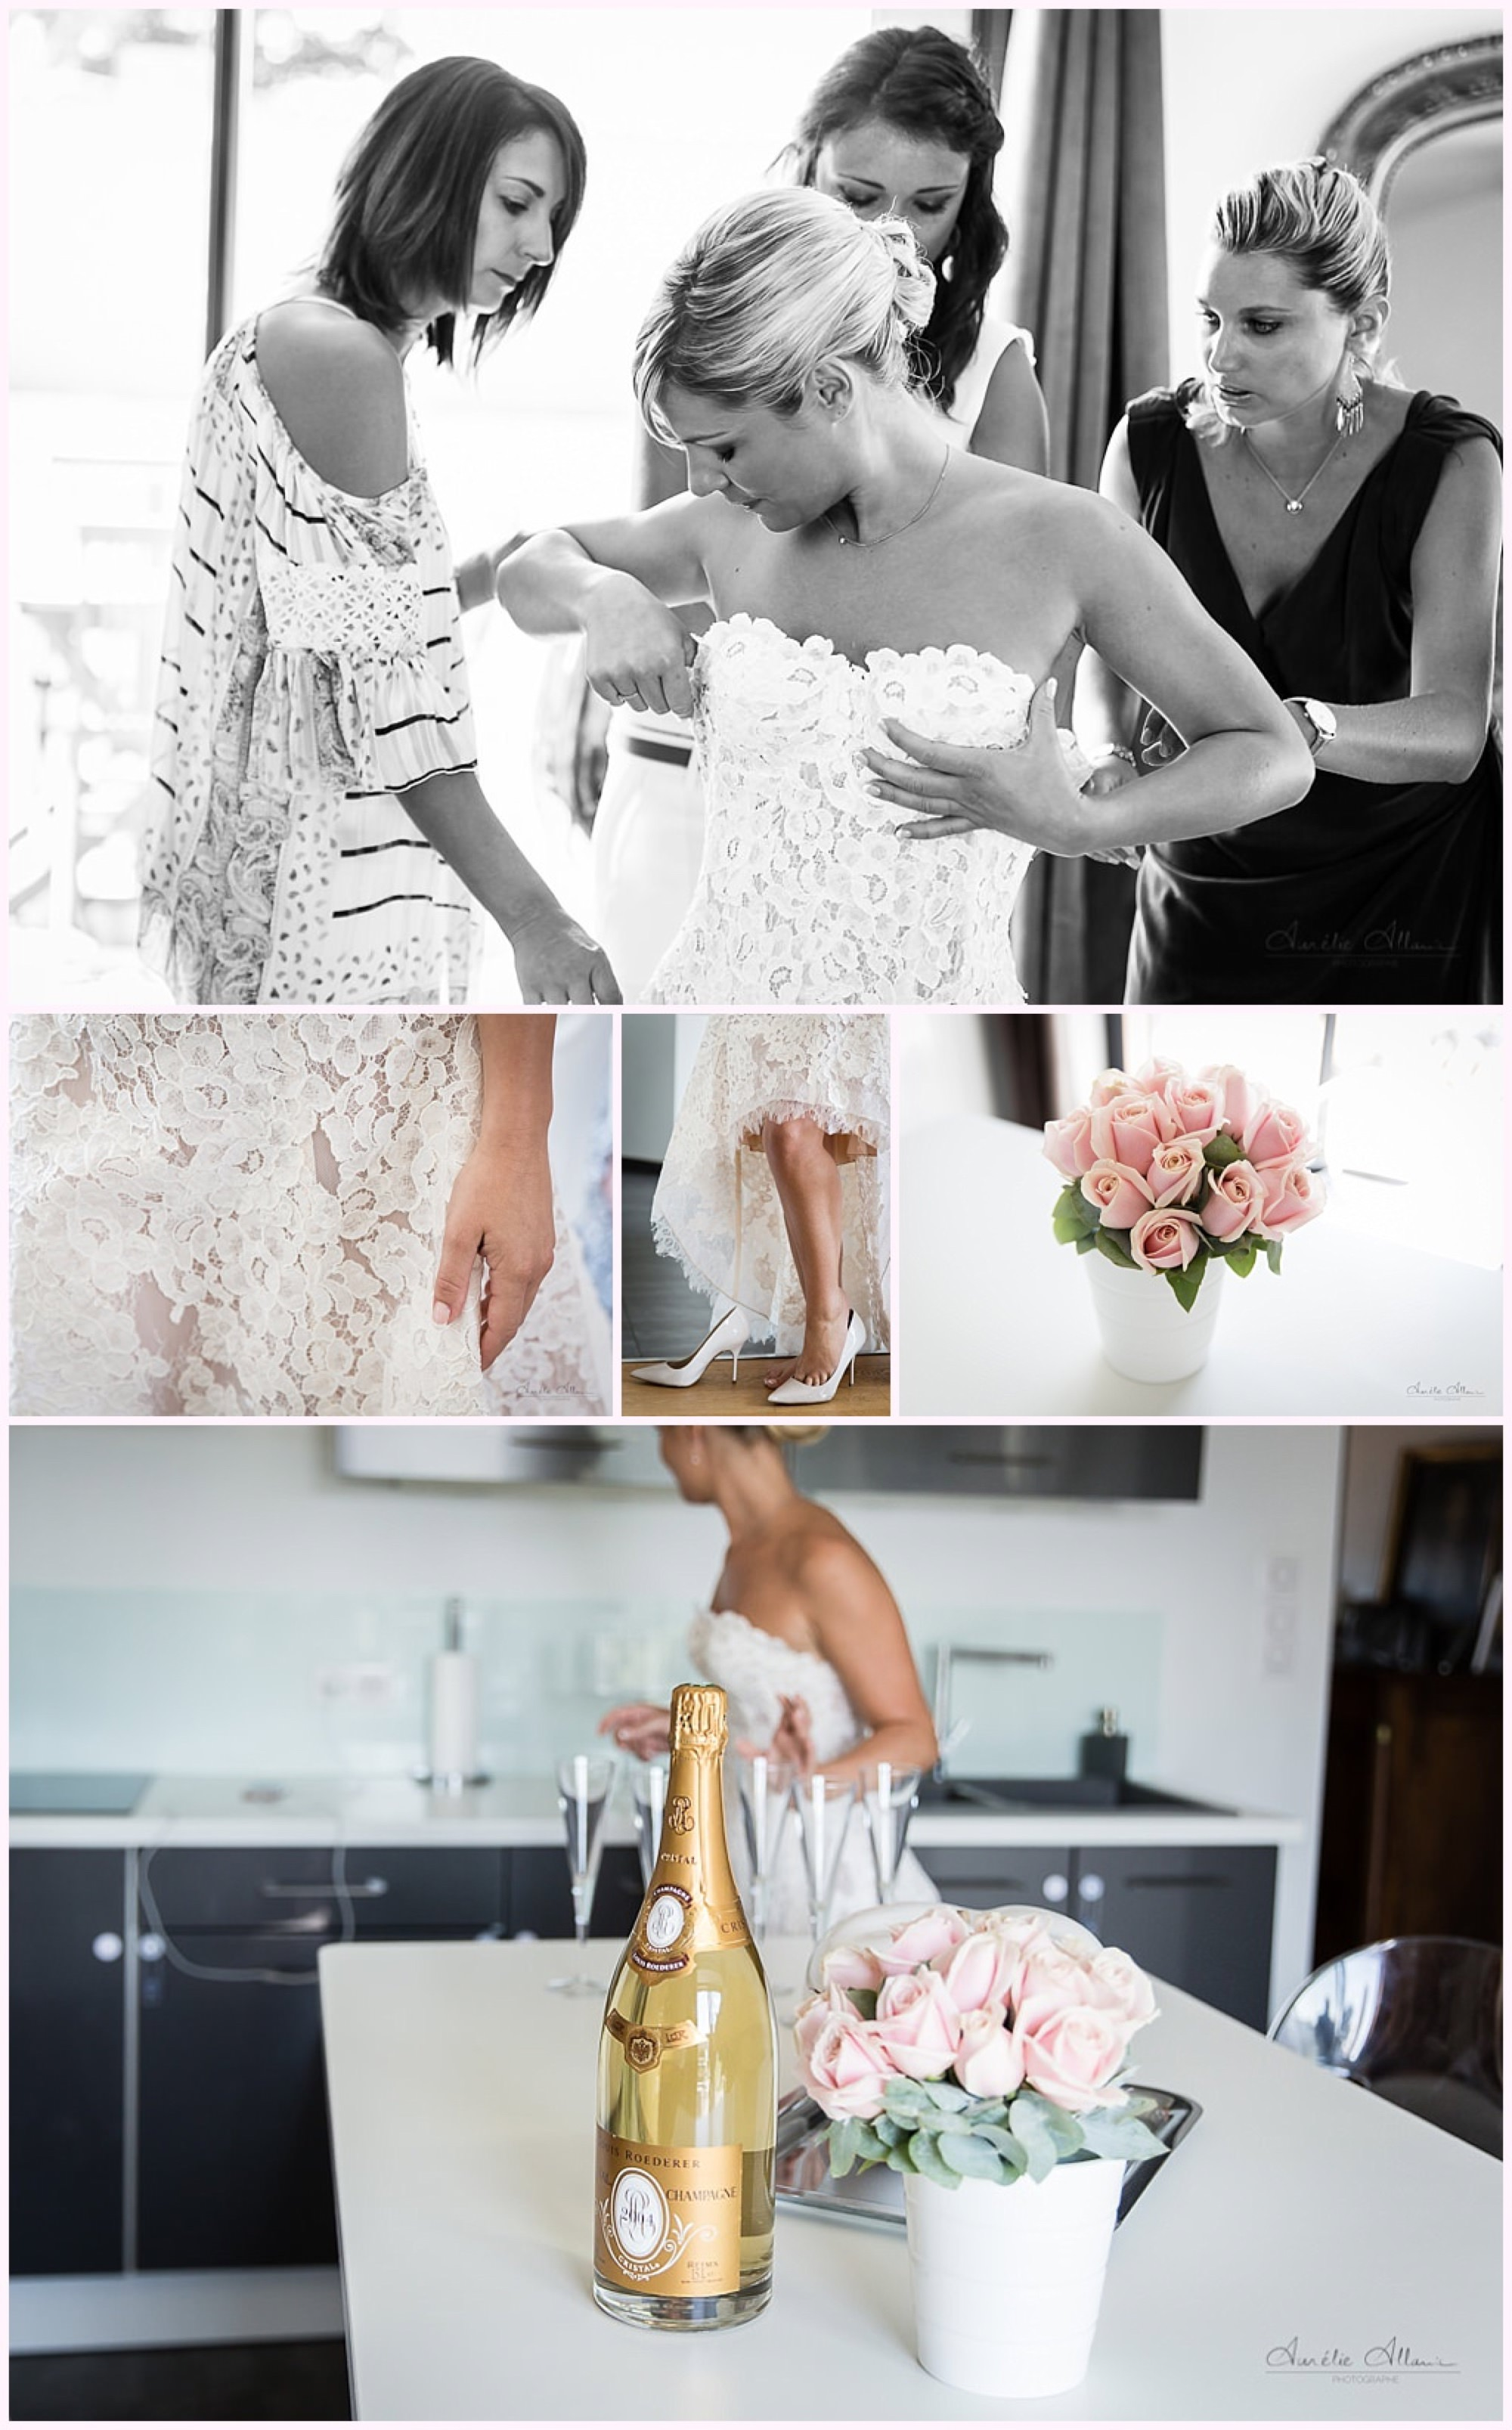 habillage mariée champagne